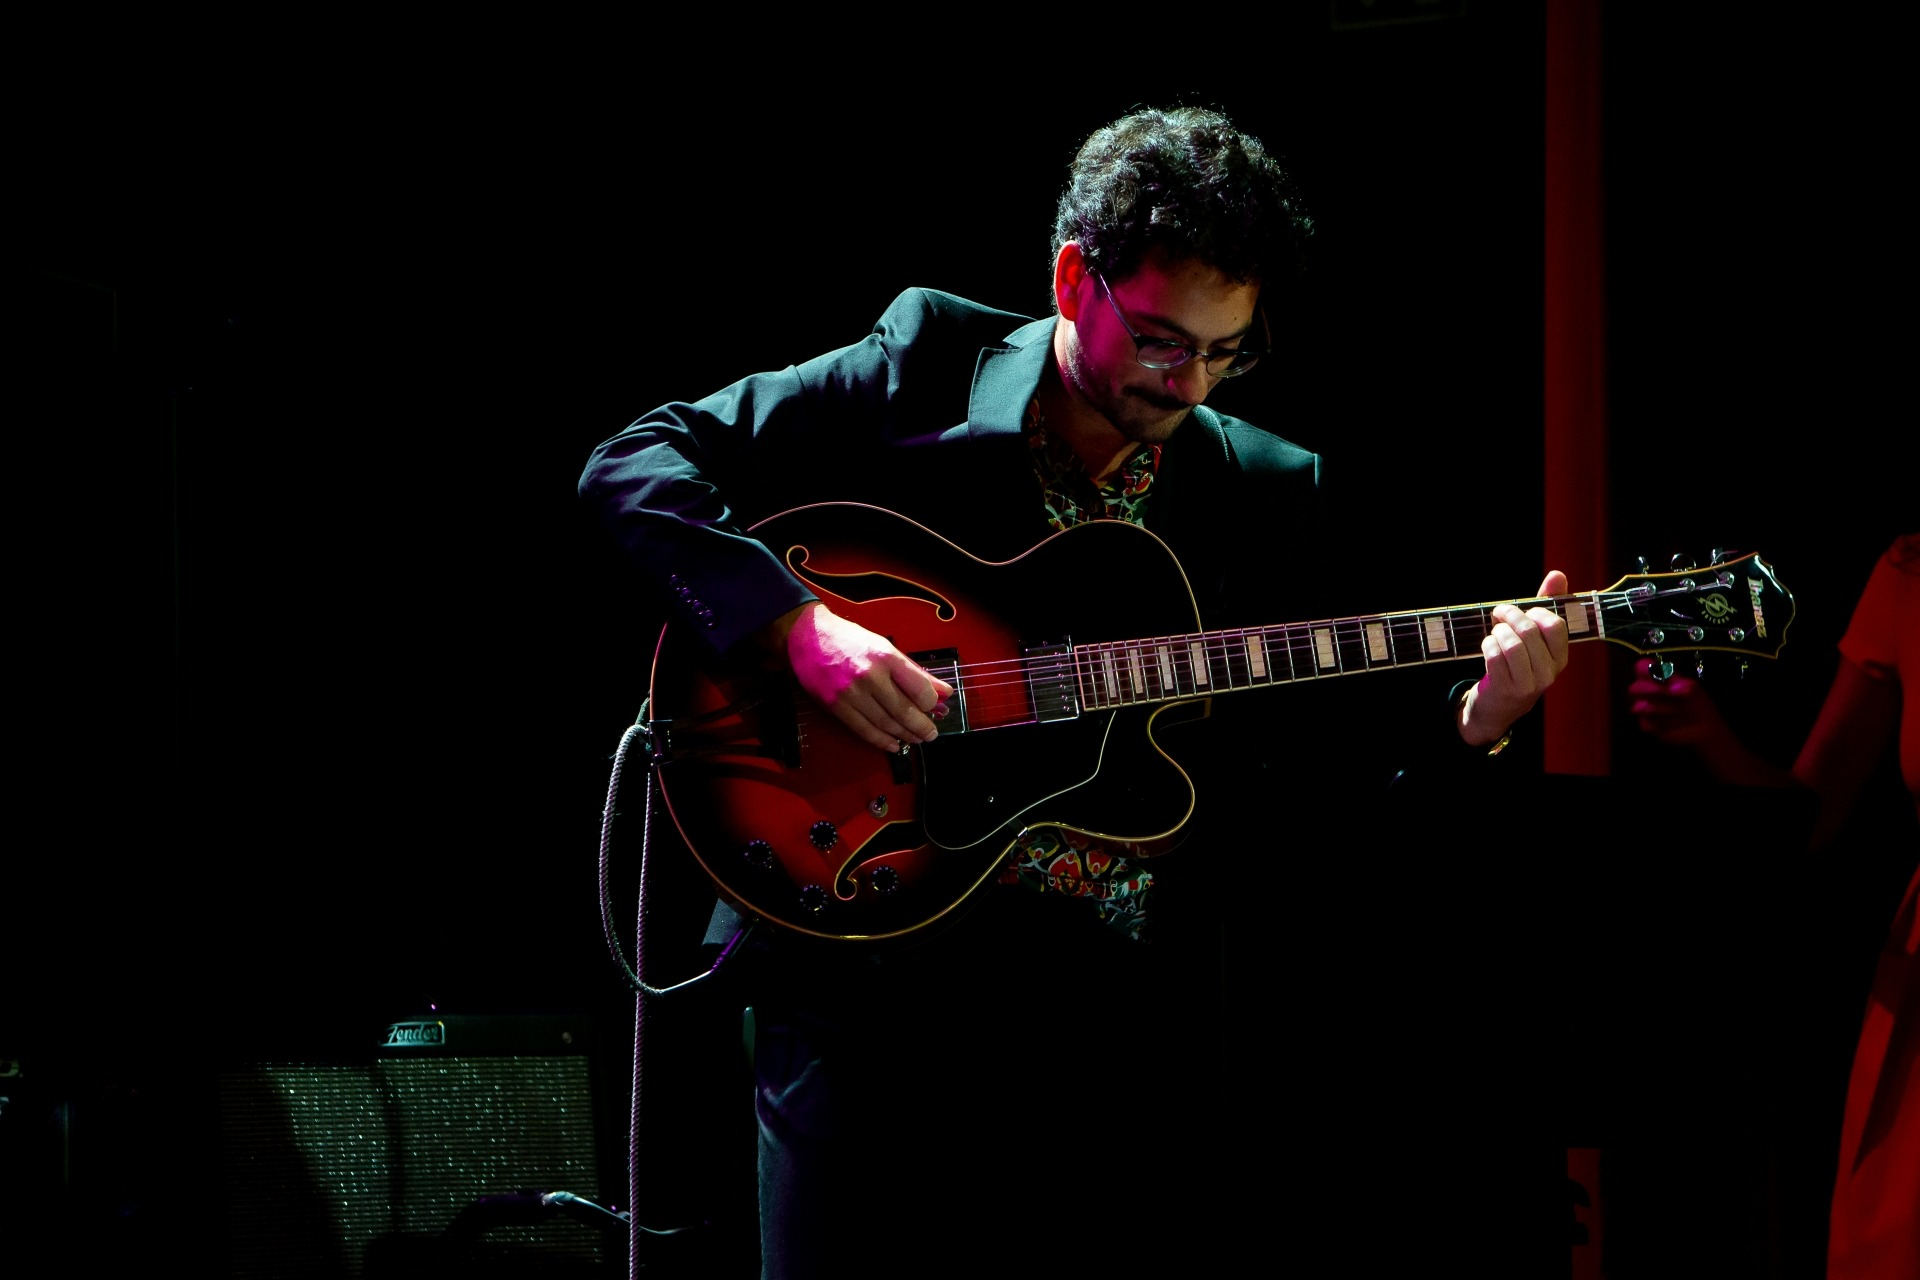 Bruno Pernadas toca guitarra elétrica.